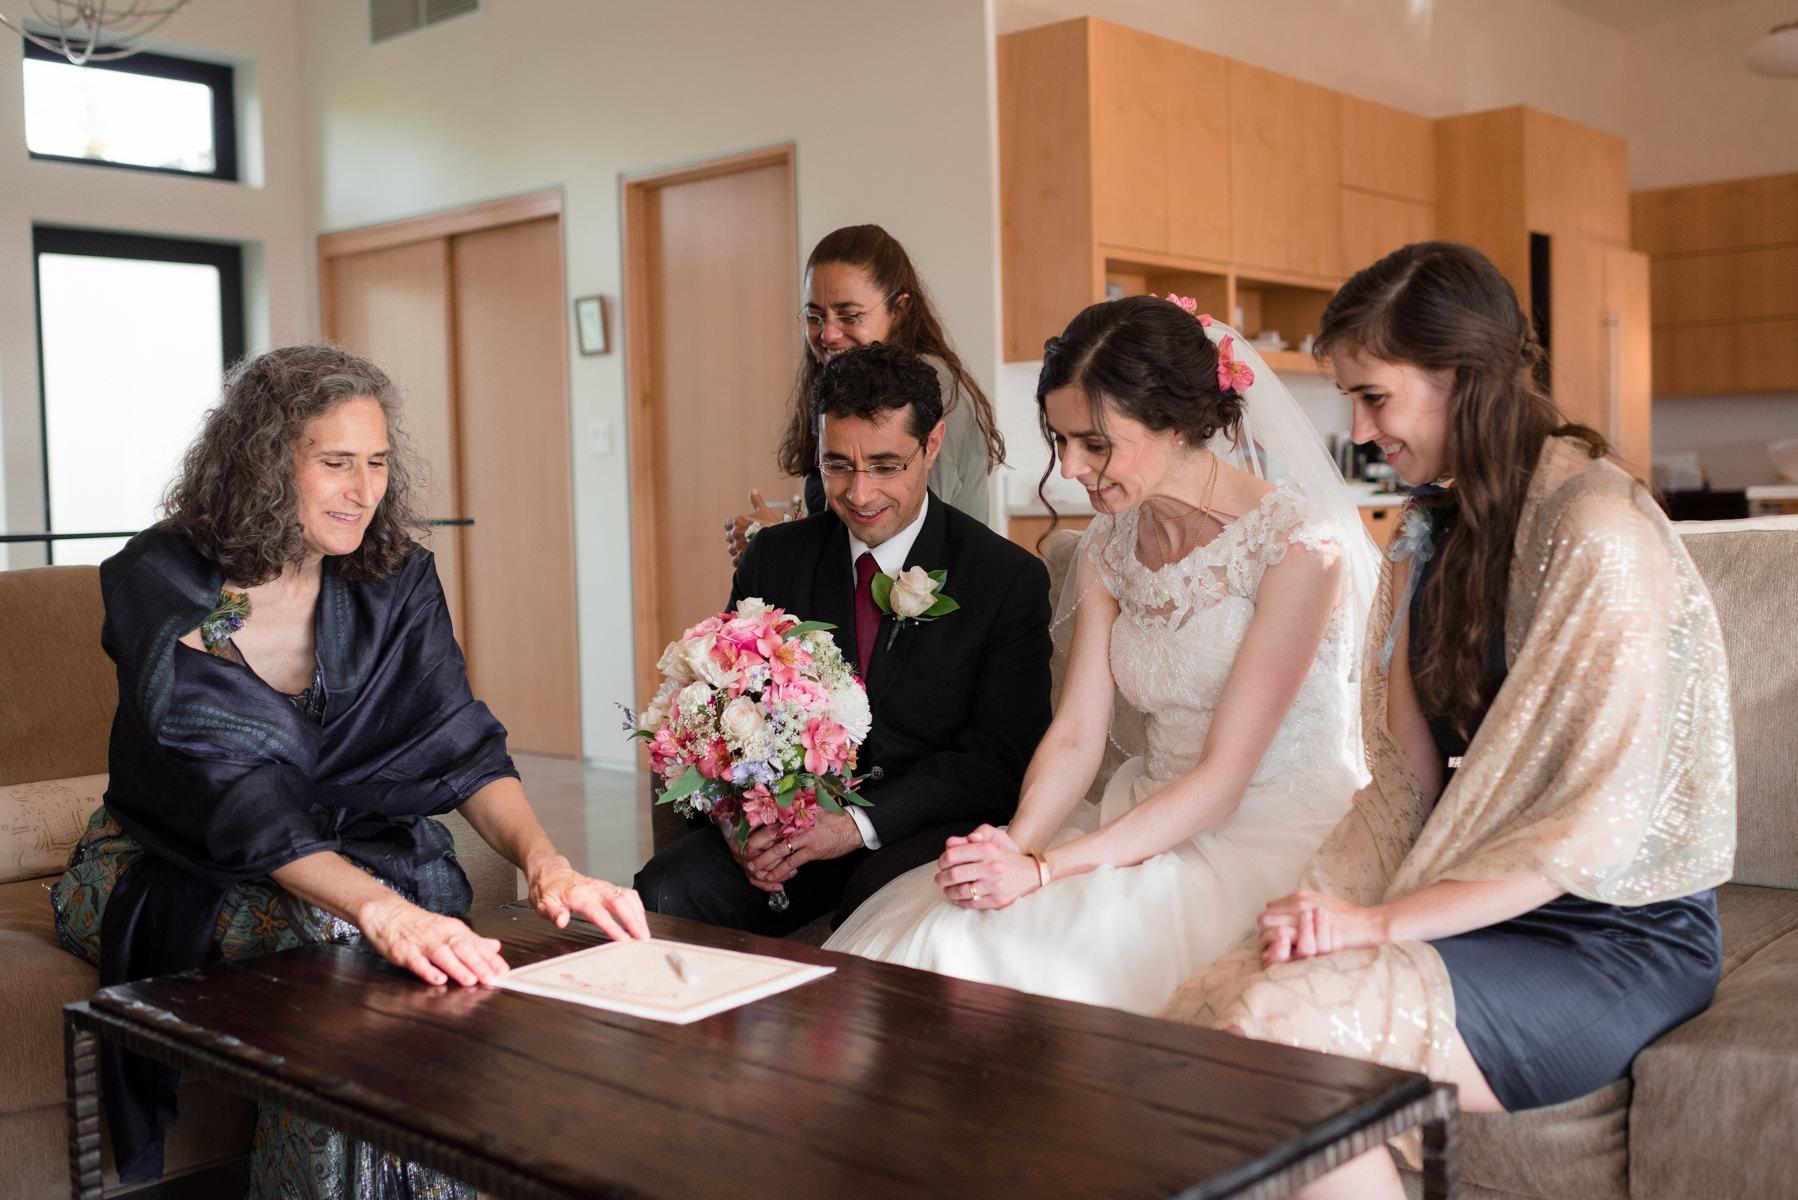 Andrew Tat - Documentary Wedding Photography - Kirkland, Washington - Emily & Cuauh - 29.JPG